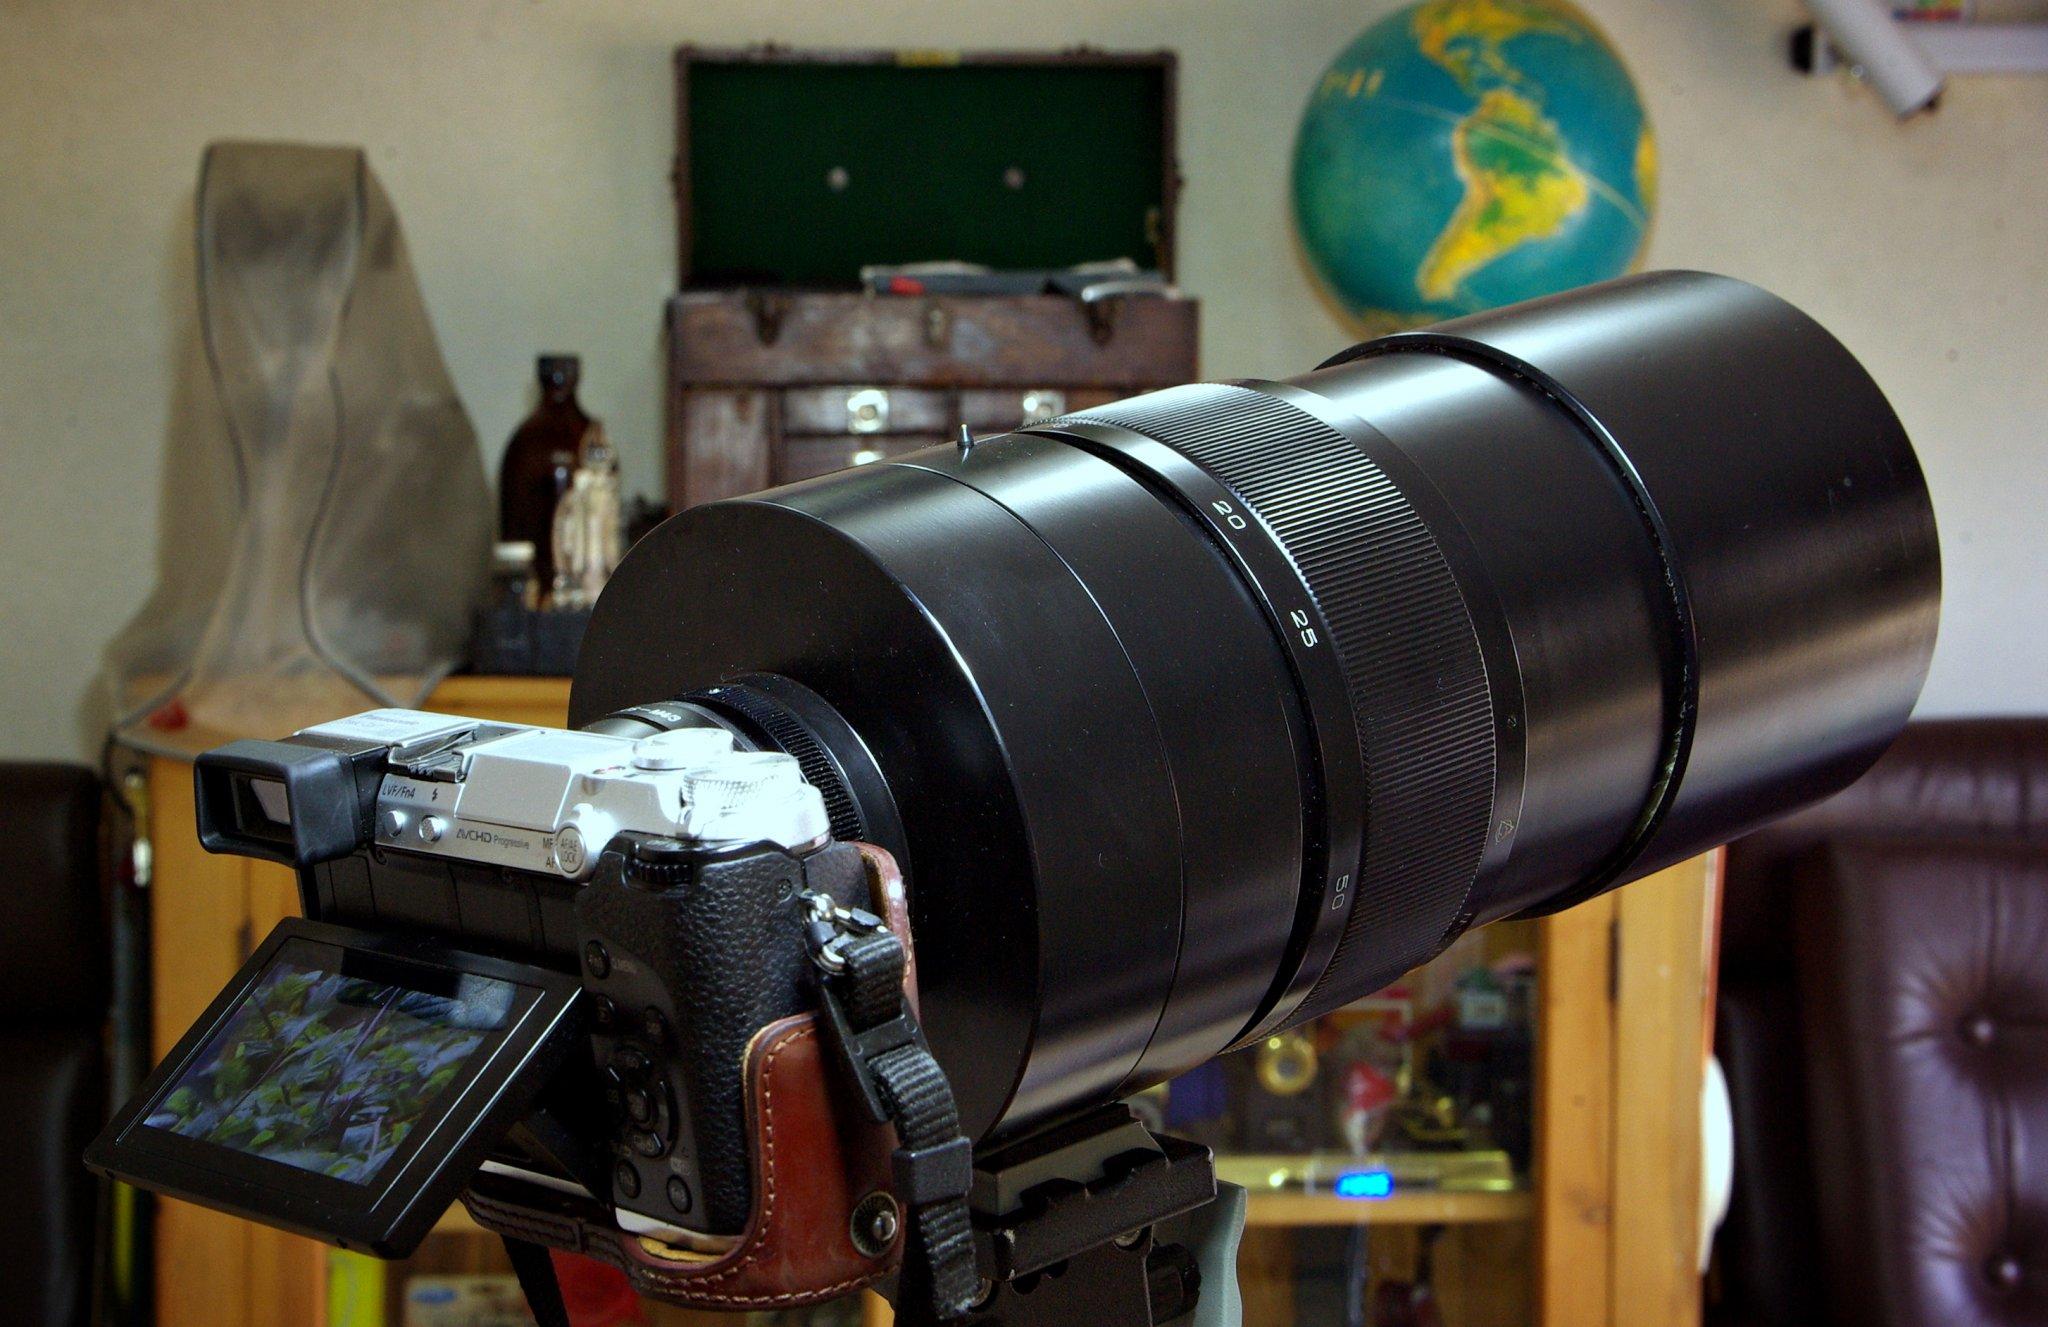 20170804-imgp4640-mto-1000mm-catadioptric-lens